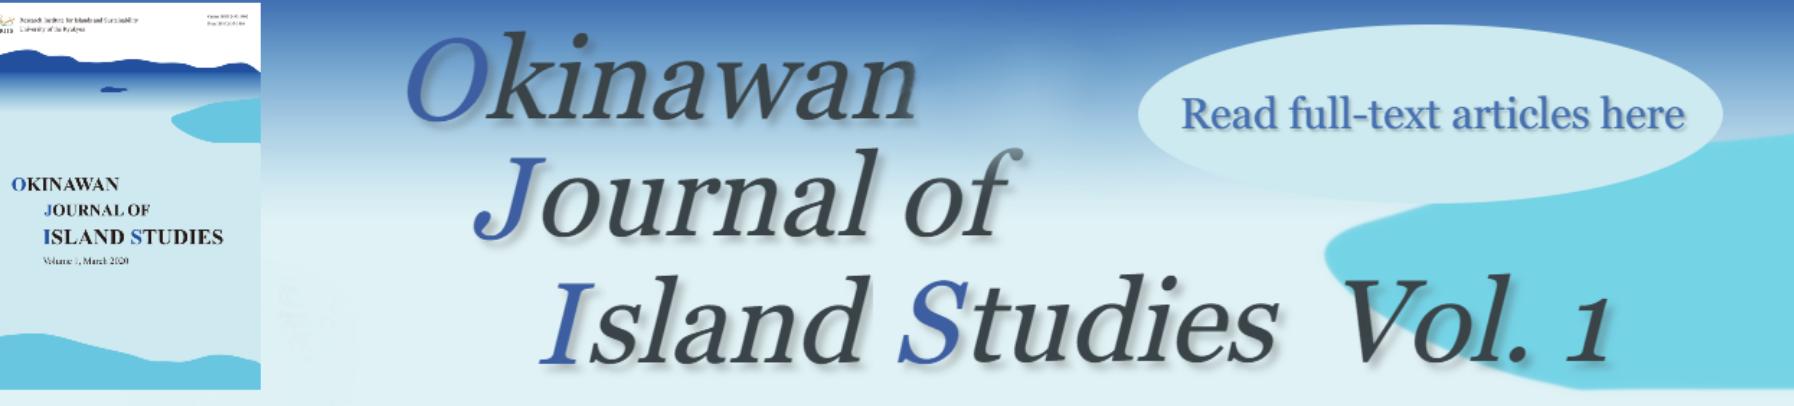 Okinawan Journal of Island Studies